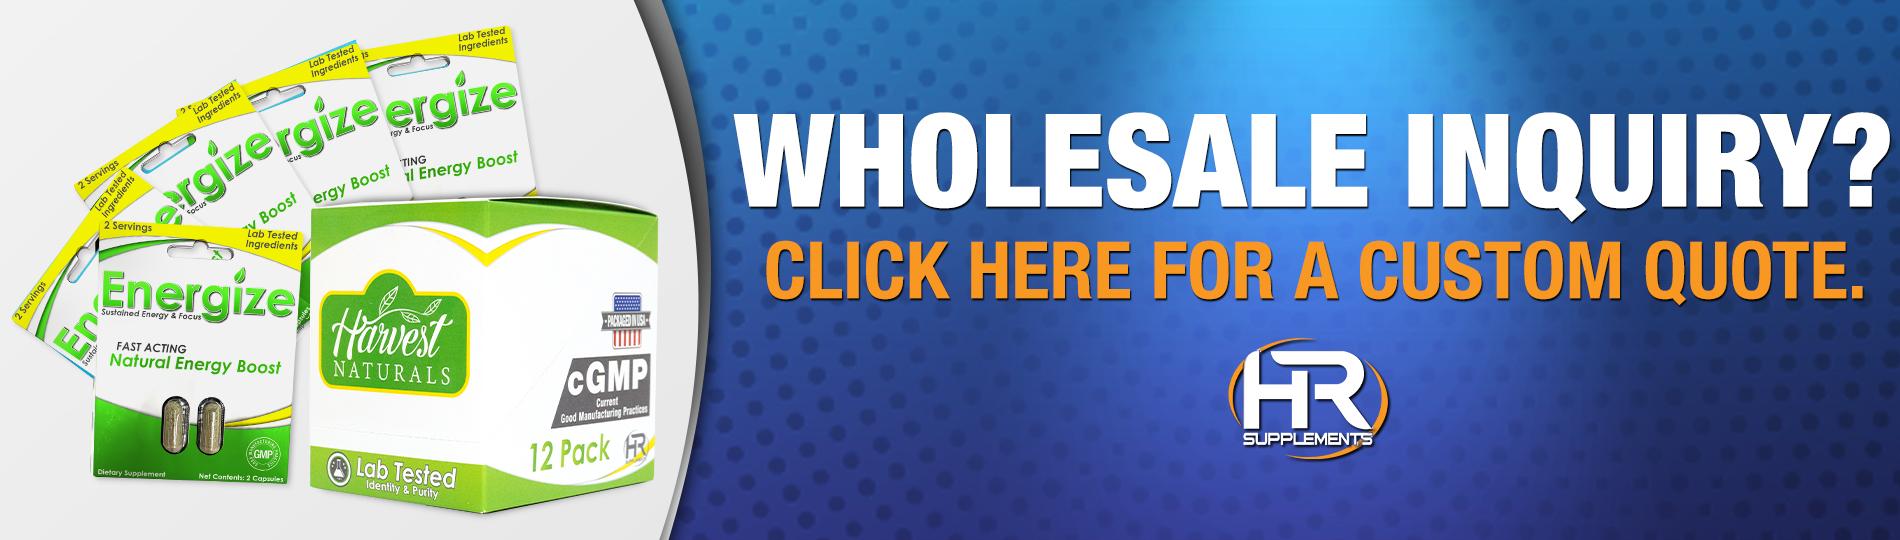 energize-wholesale-inquiry